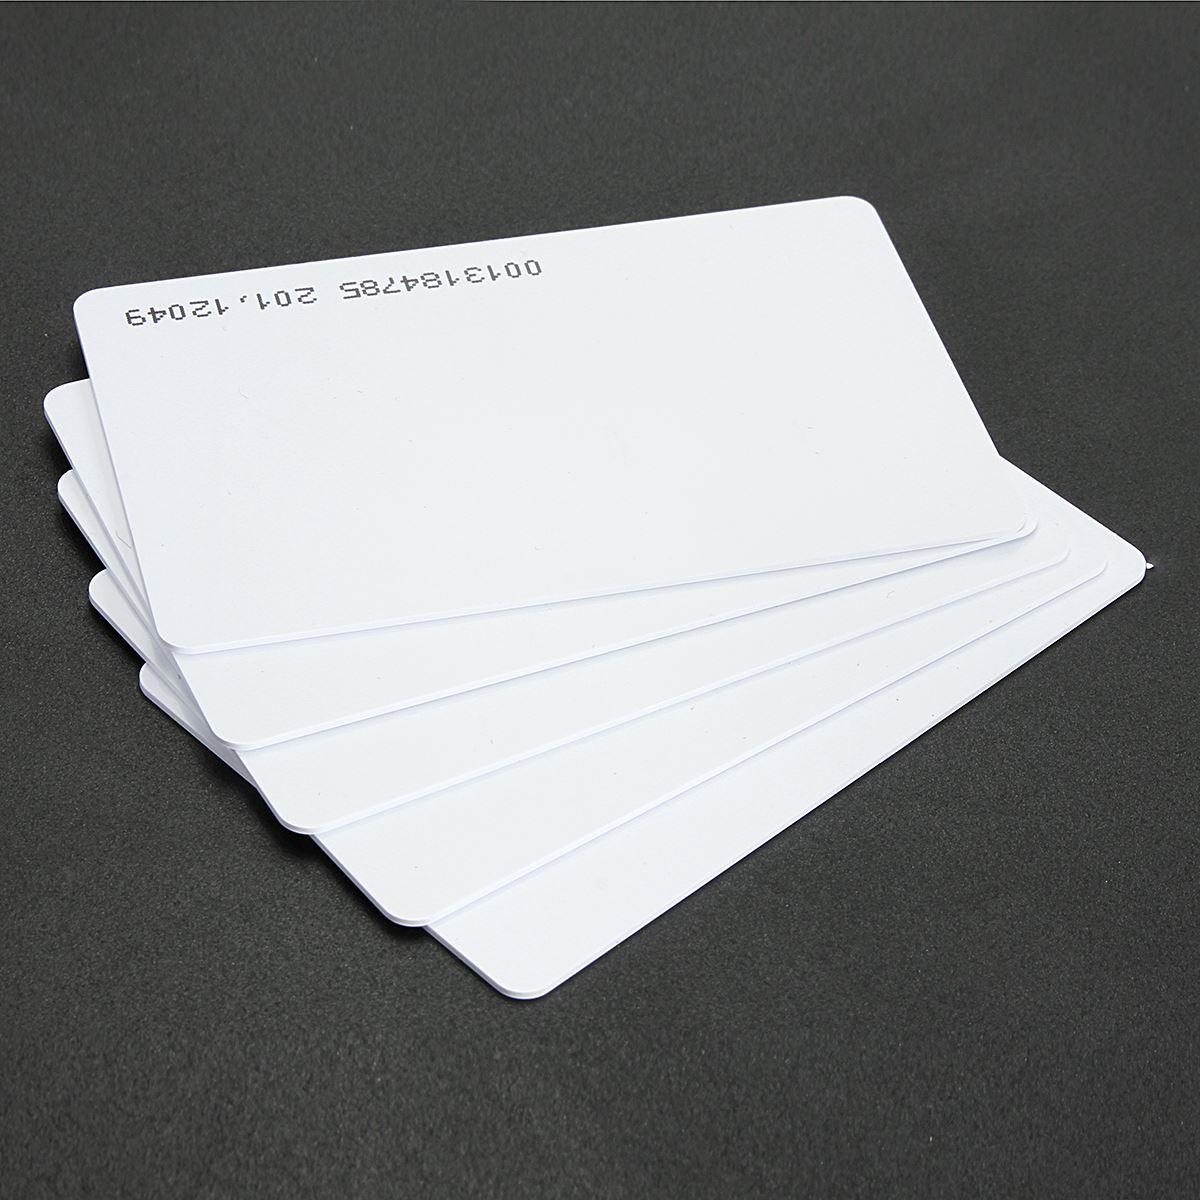 5Pcs RFID 125khz Card Proximity ID Access control EM4100 EM4200(China (Mainland))